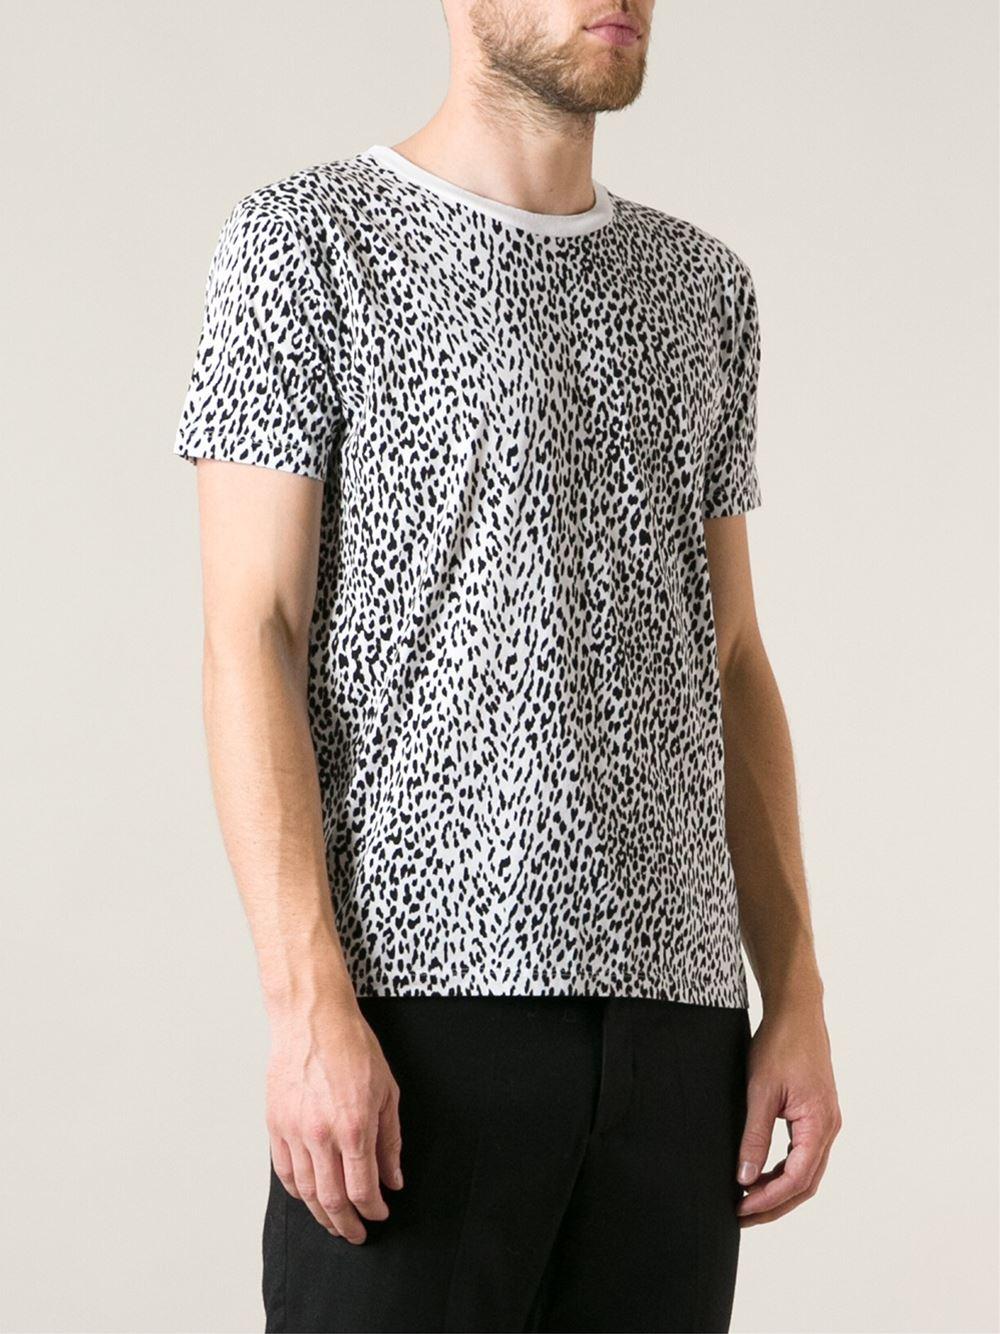 dd0a1f5841 Saint Laurent Leopard Print Tshirt in White for Men - Lyst